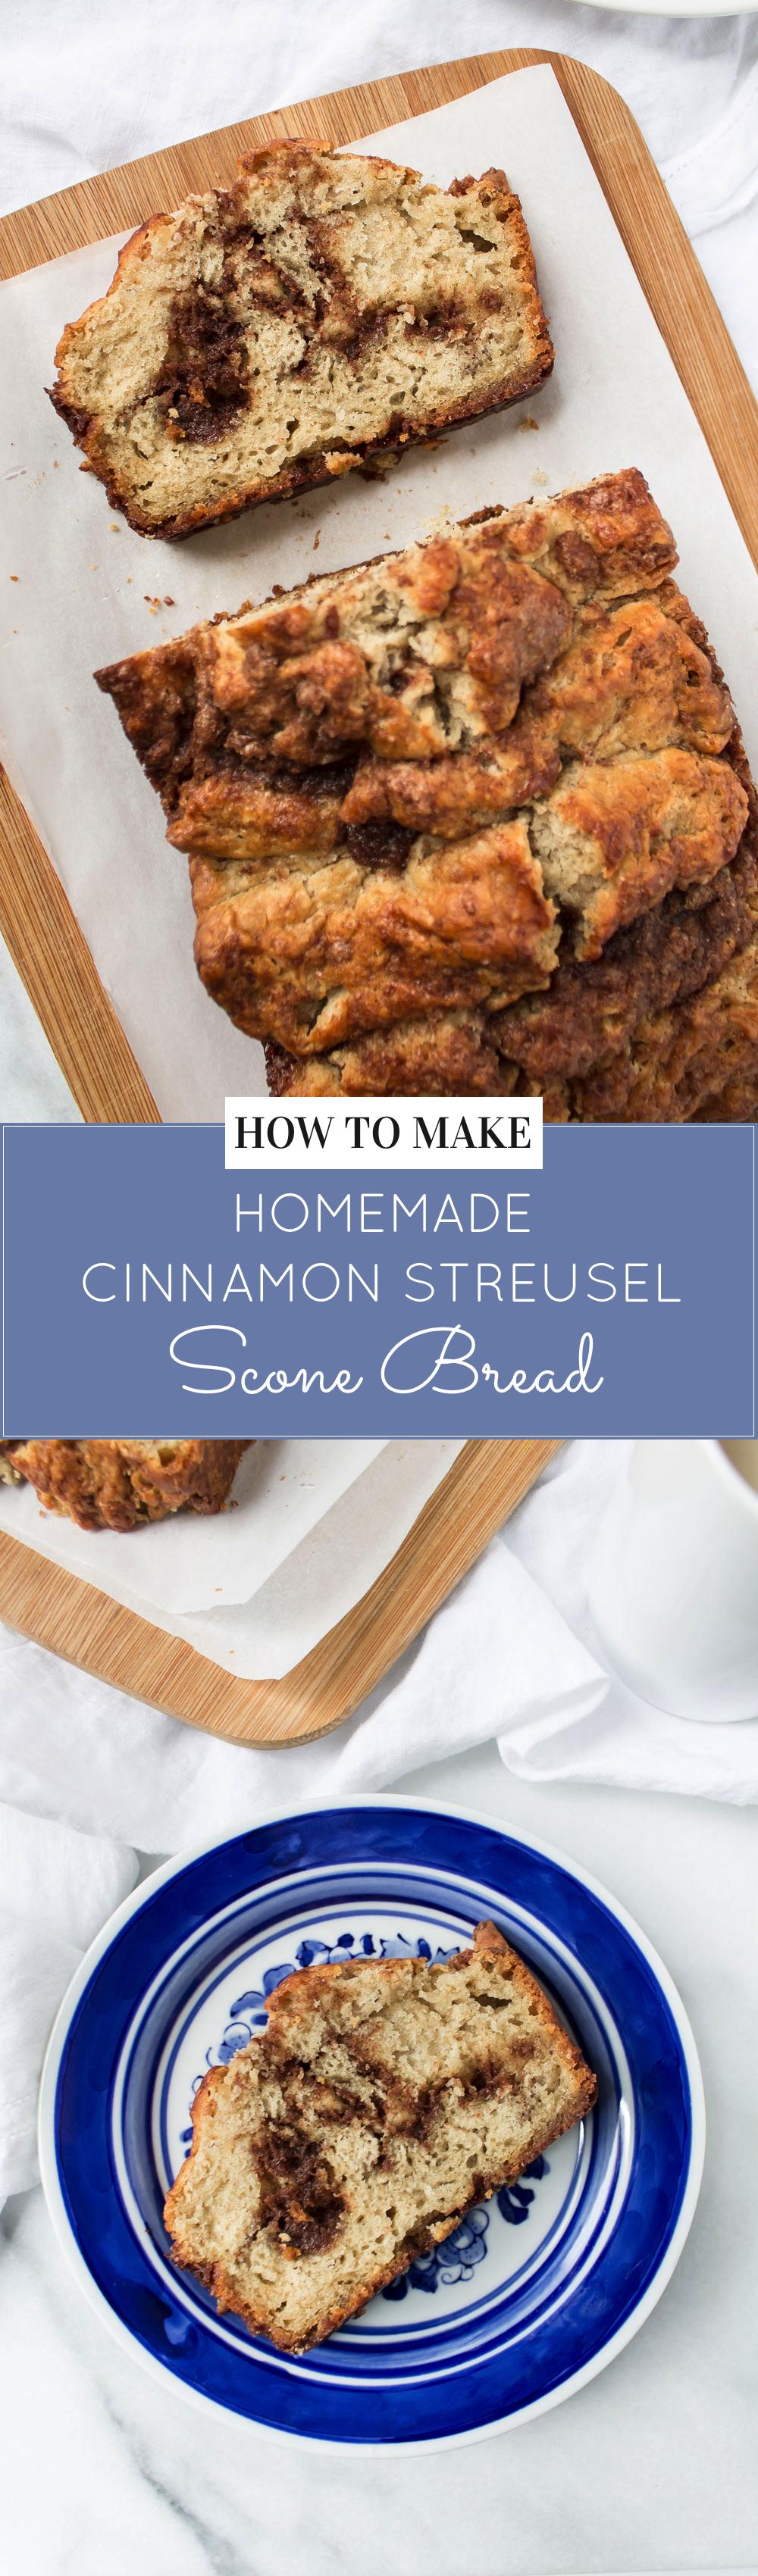 Food Blogger Lexi of Glitter, Inc. shares how to make homemade cinnamon streusel scone bread on Glitter, Inc. Click through for the recipe. | glitterinc.com | @glitterinc